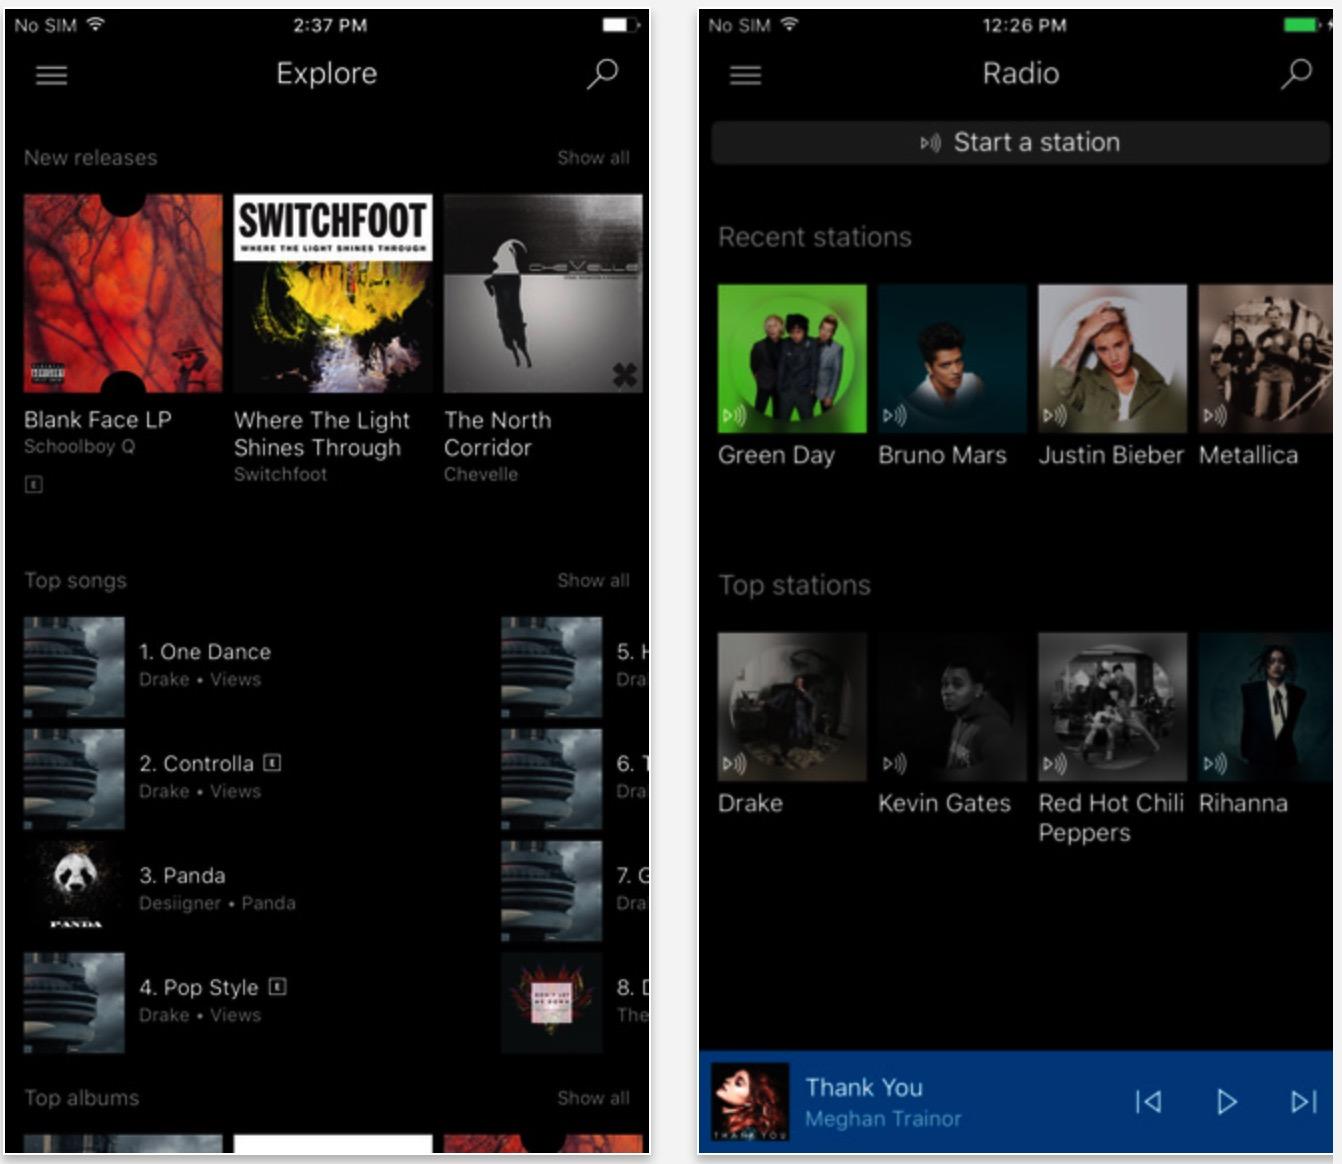 Microsoft Overhauls 'Groove' Music Streaming App for iOS - MacRumors